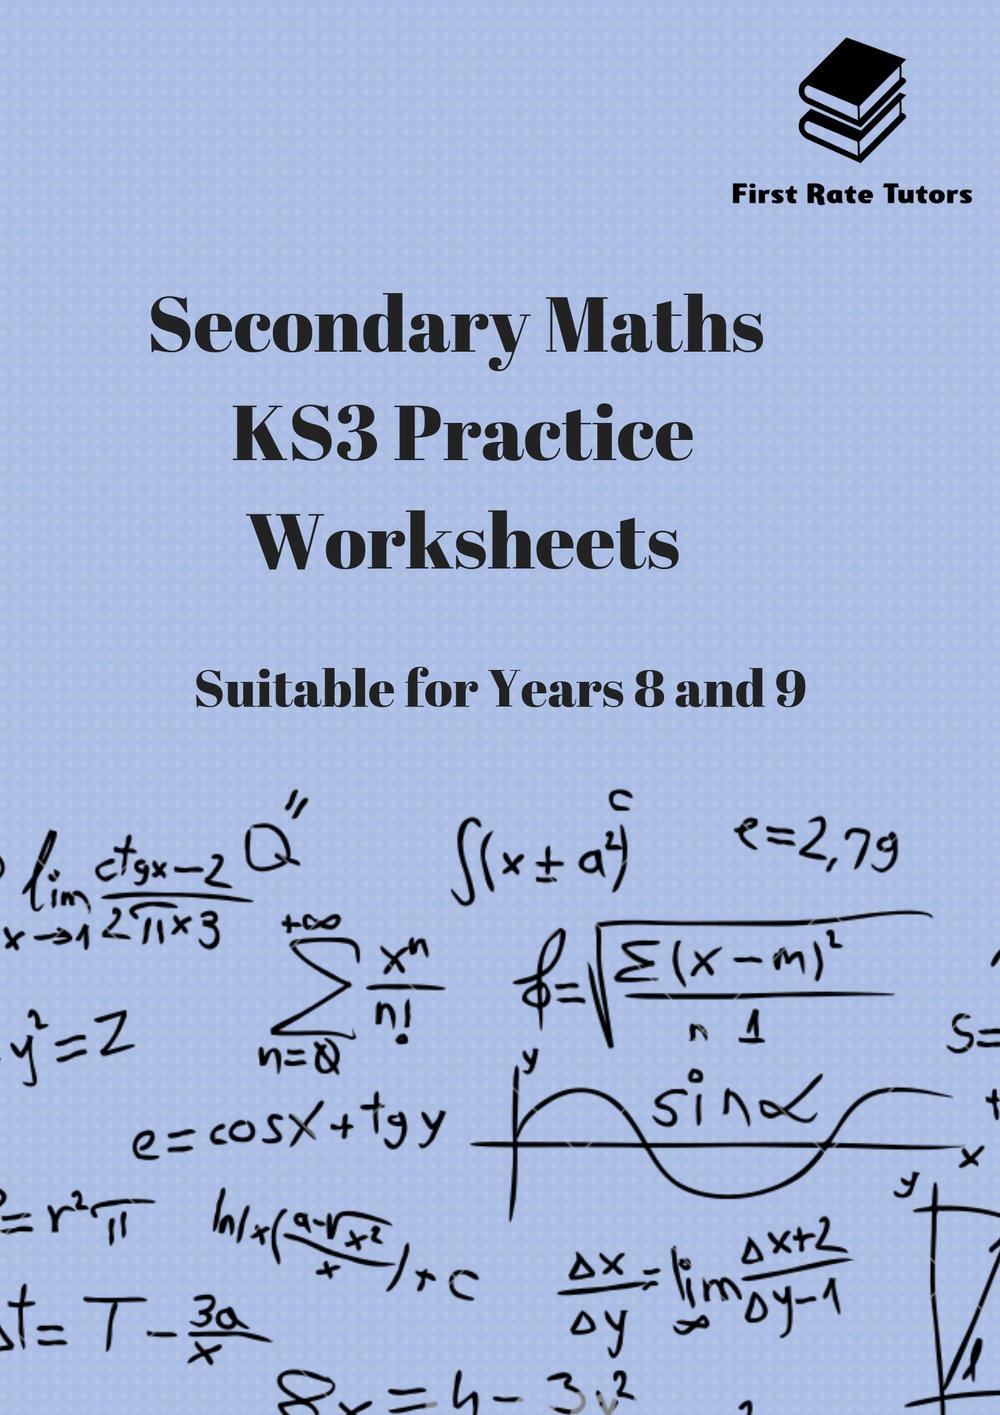 Secondary+Maths+KS3+Practice+Worksheets.jpg